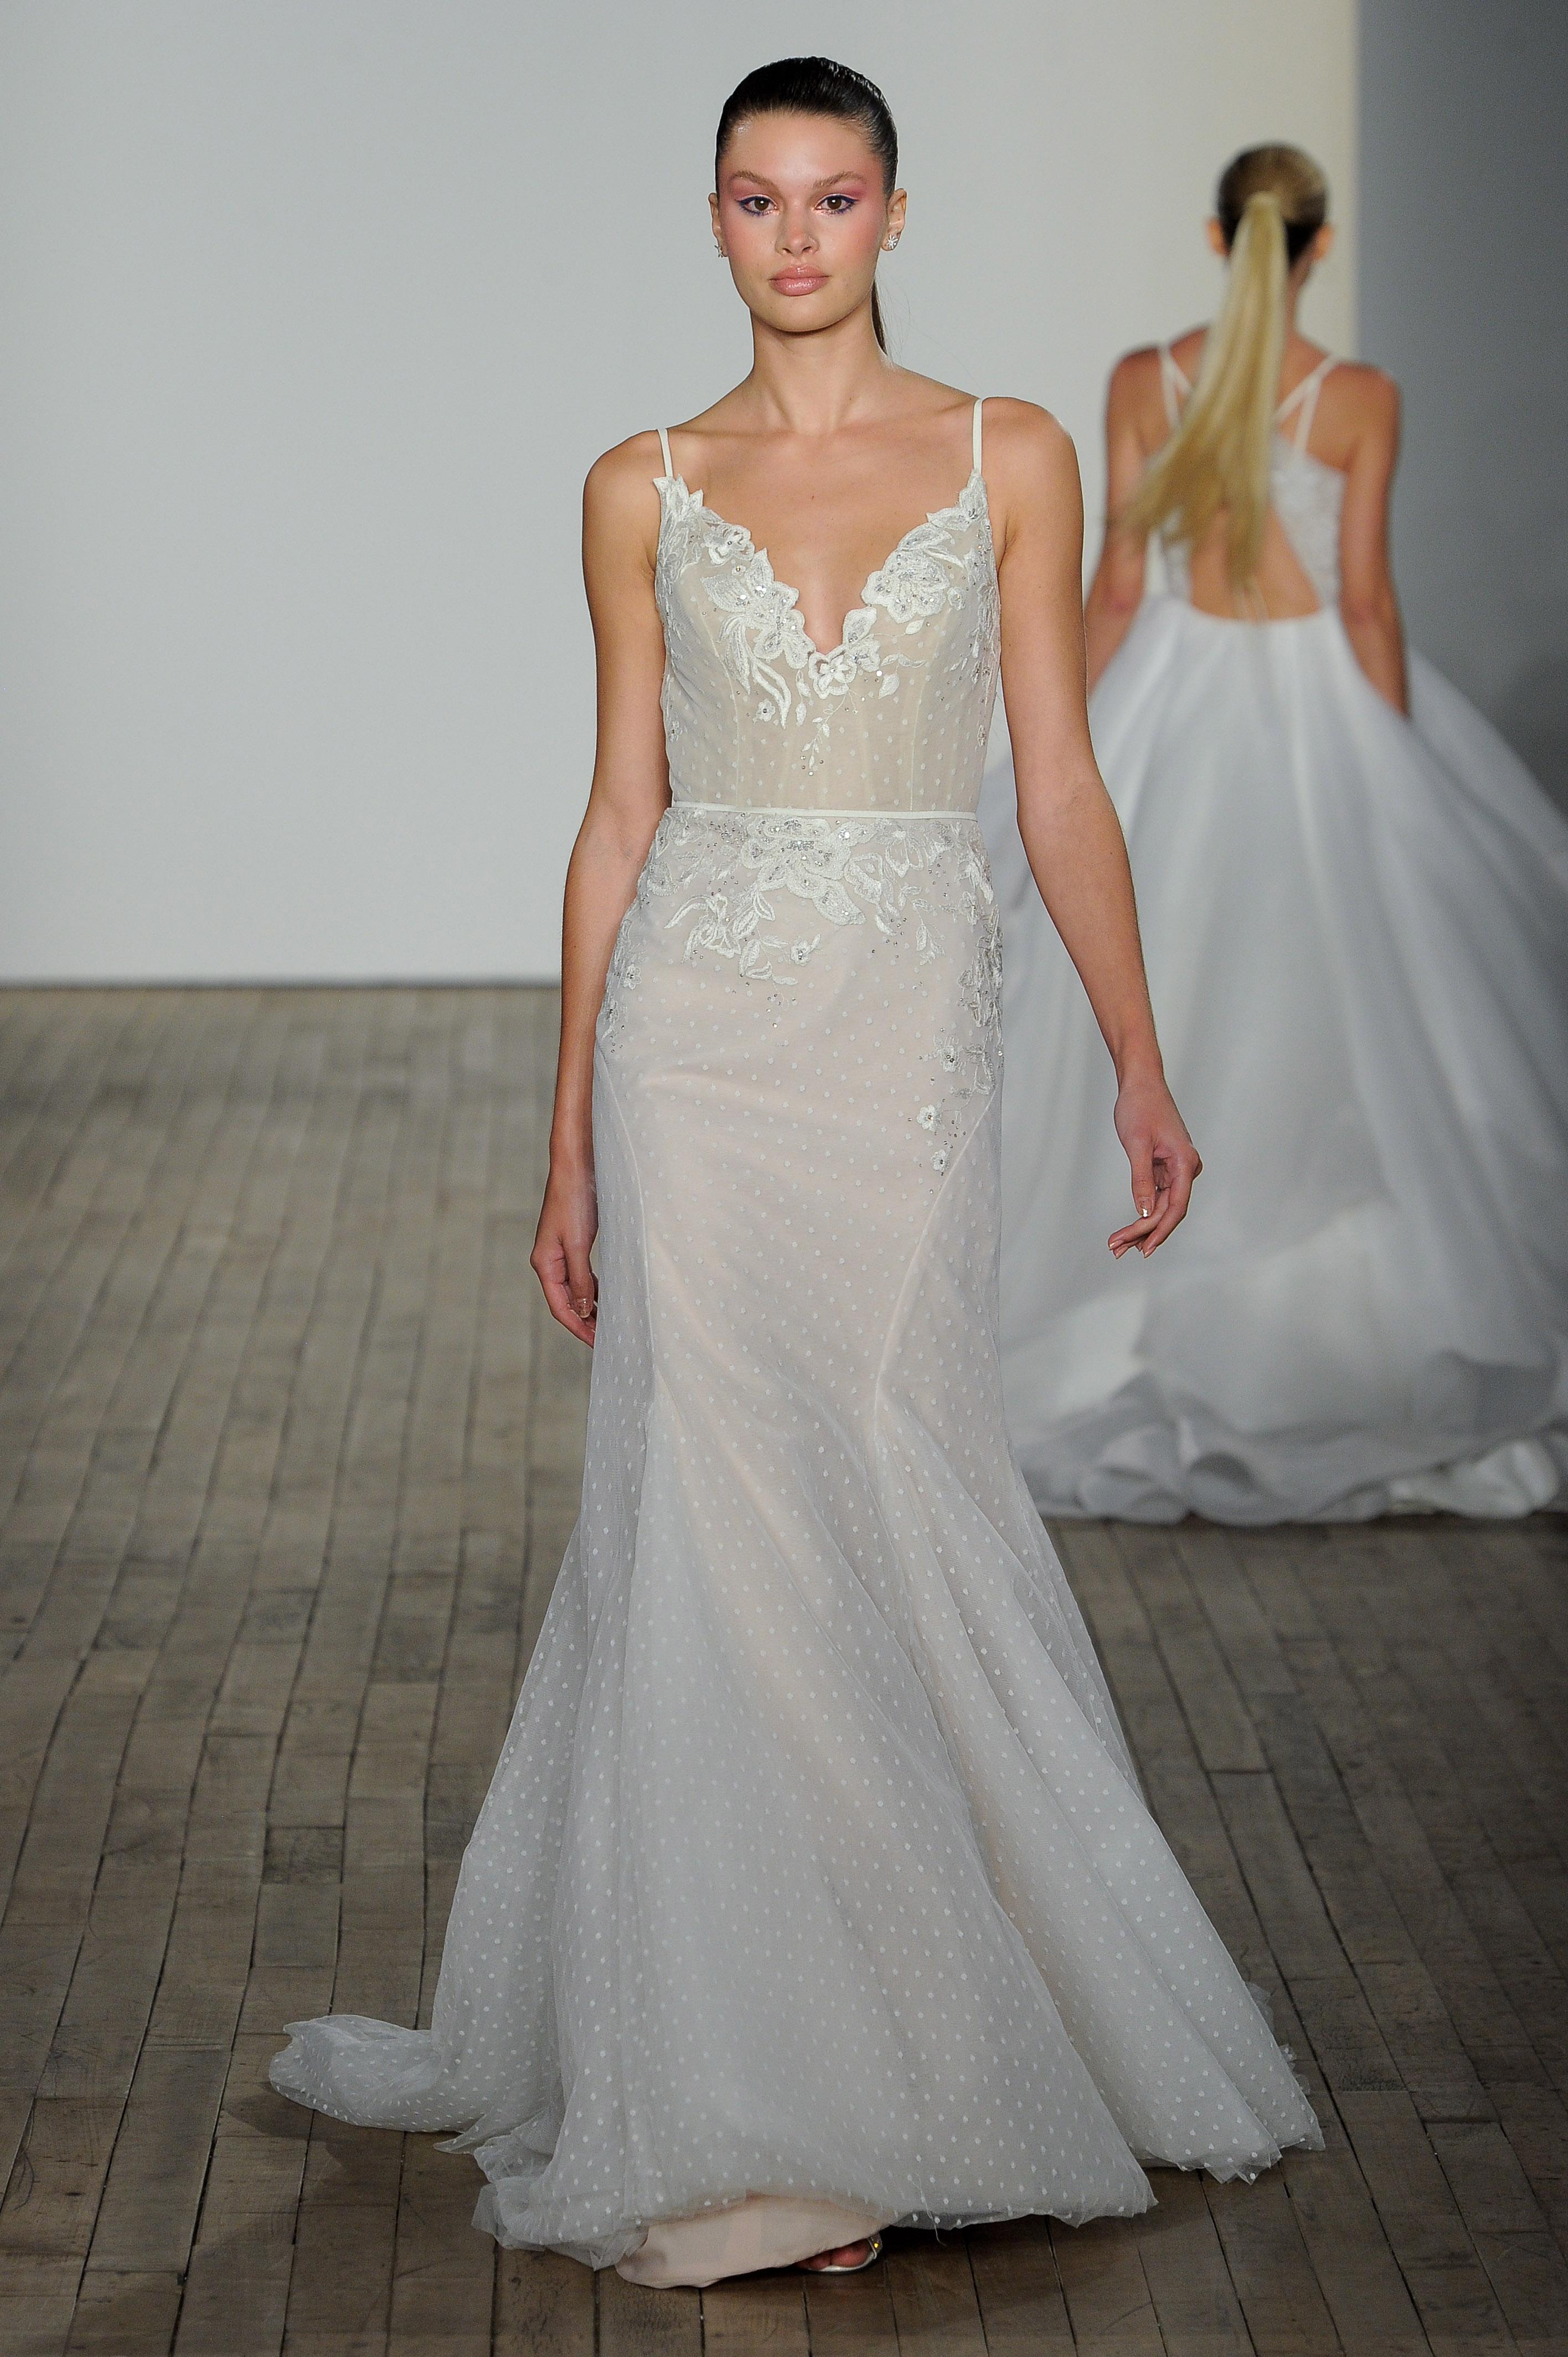 haley paige fall 2019 spaghetti strap mermaid wedding dress